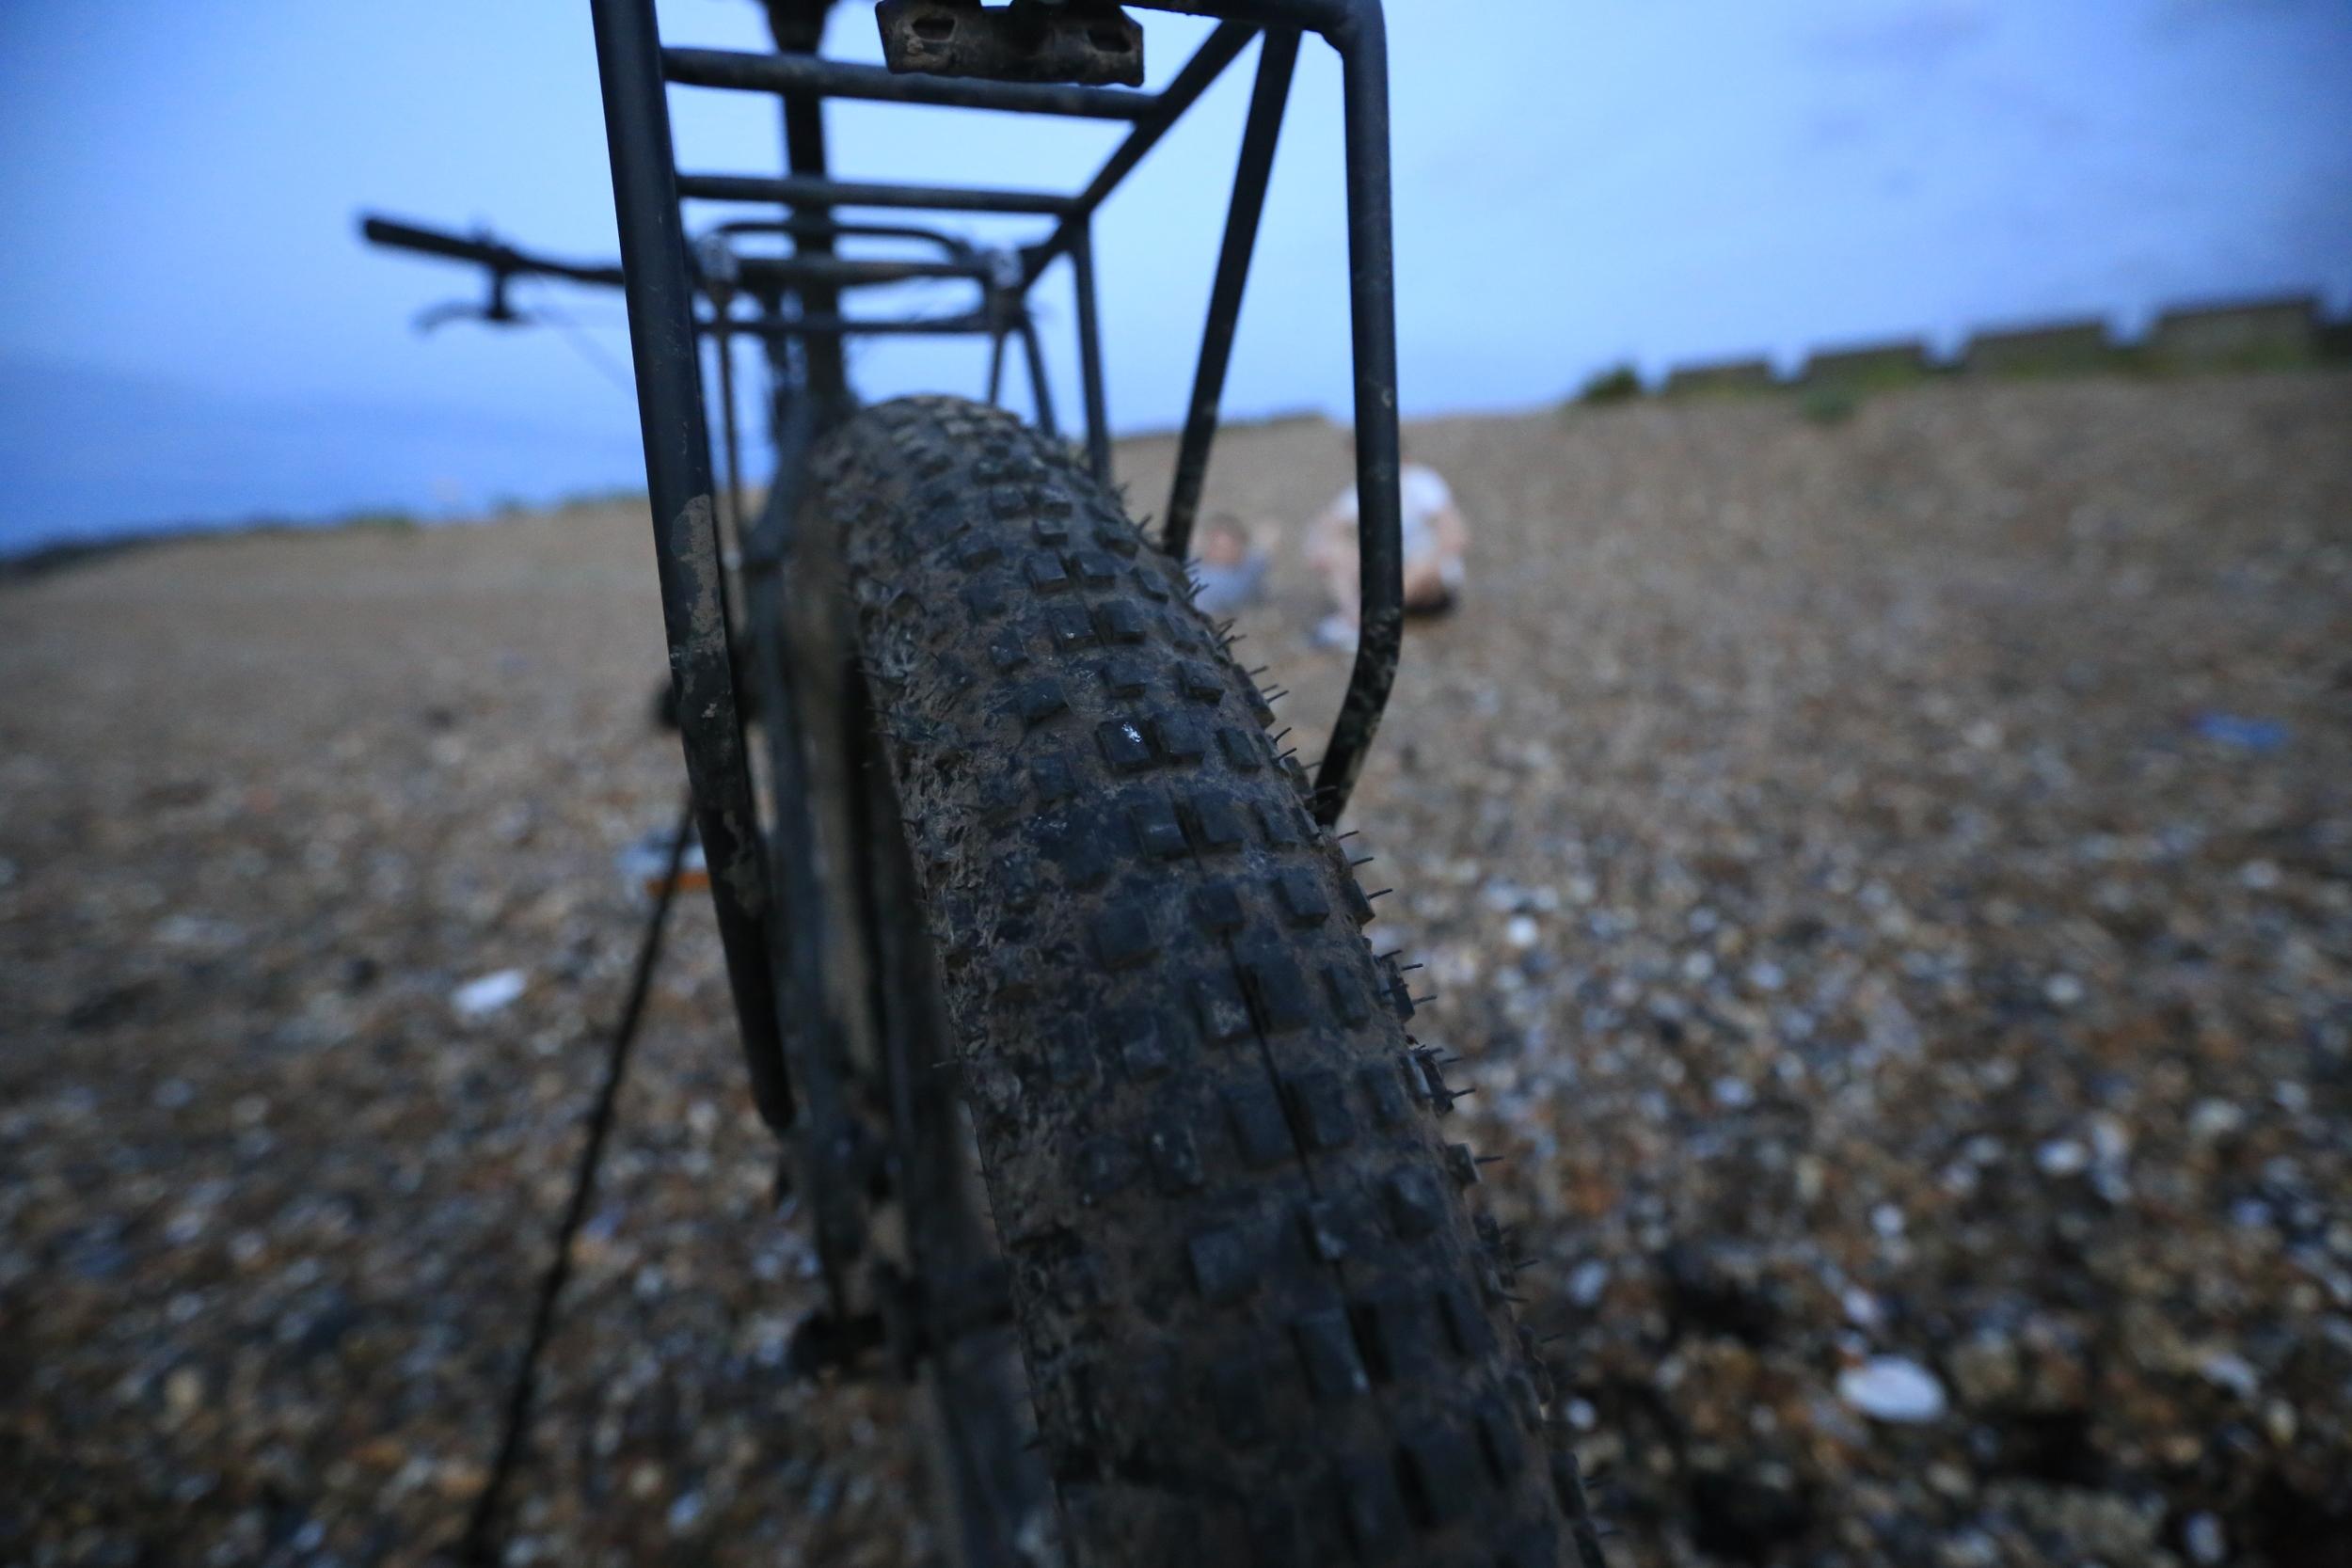 "knards, 29er, knards 3"", 29er, 29 x 3, pannier rack, surly rear rack, jones h bar, surly, surly ecr, jones h bar, klick stand, bikepacking blog, cycle touring"